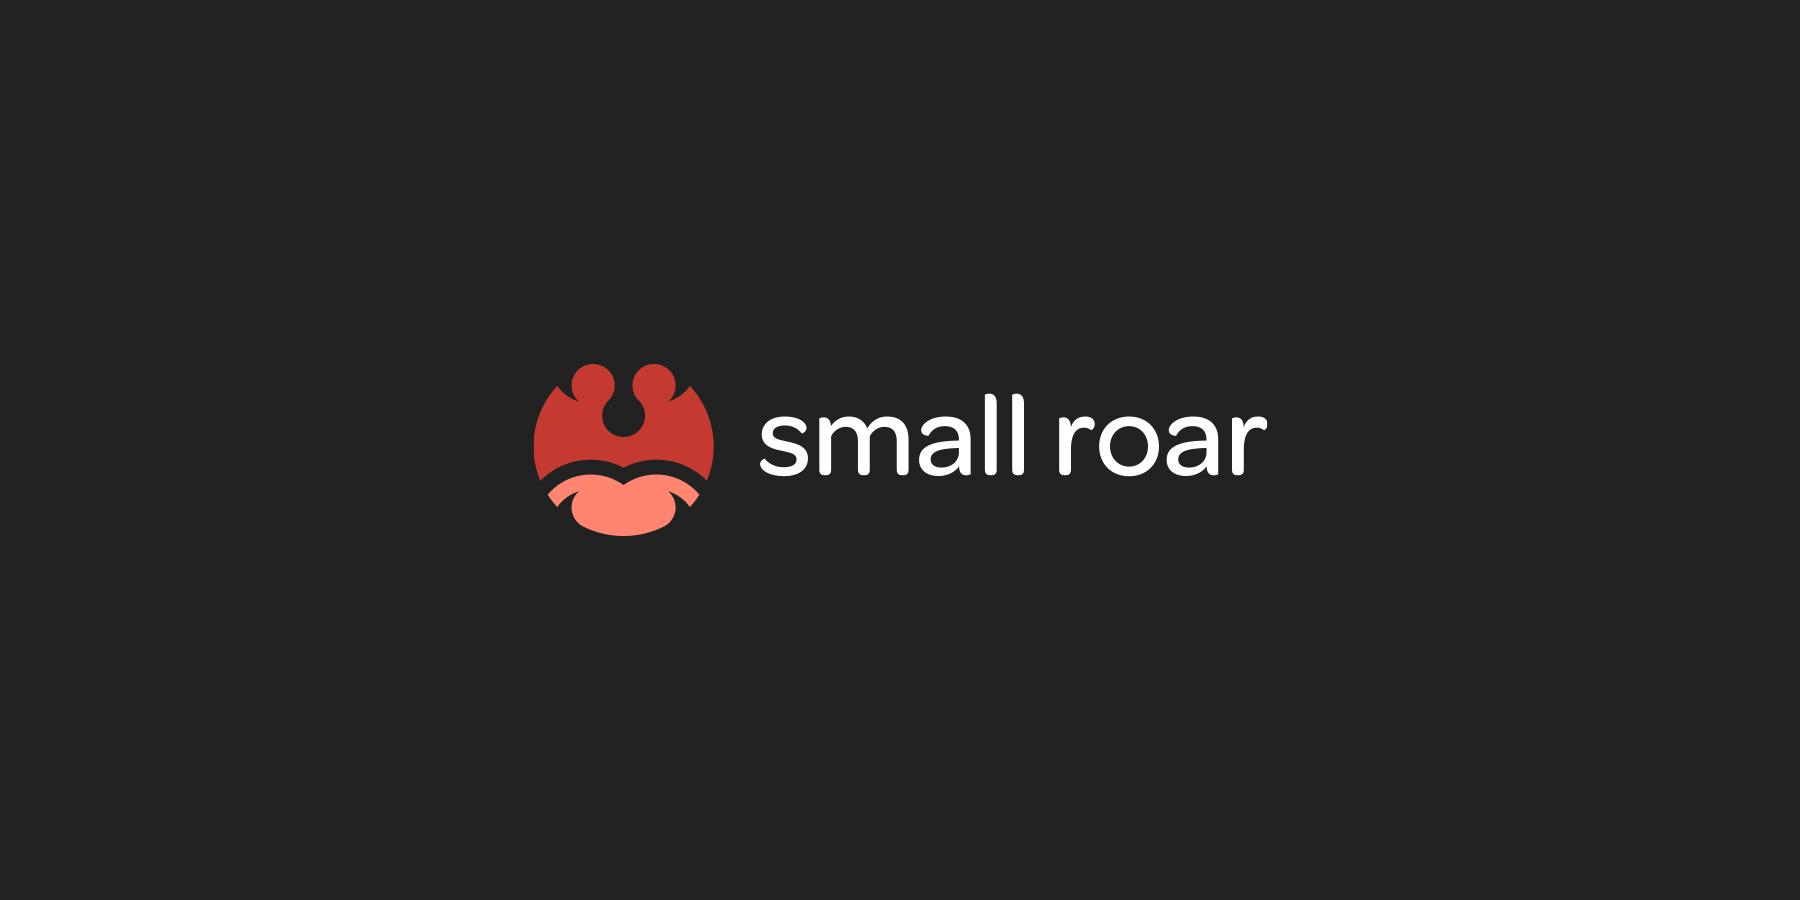 small-roar-logo-design-05